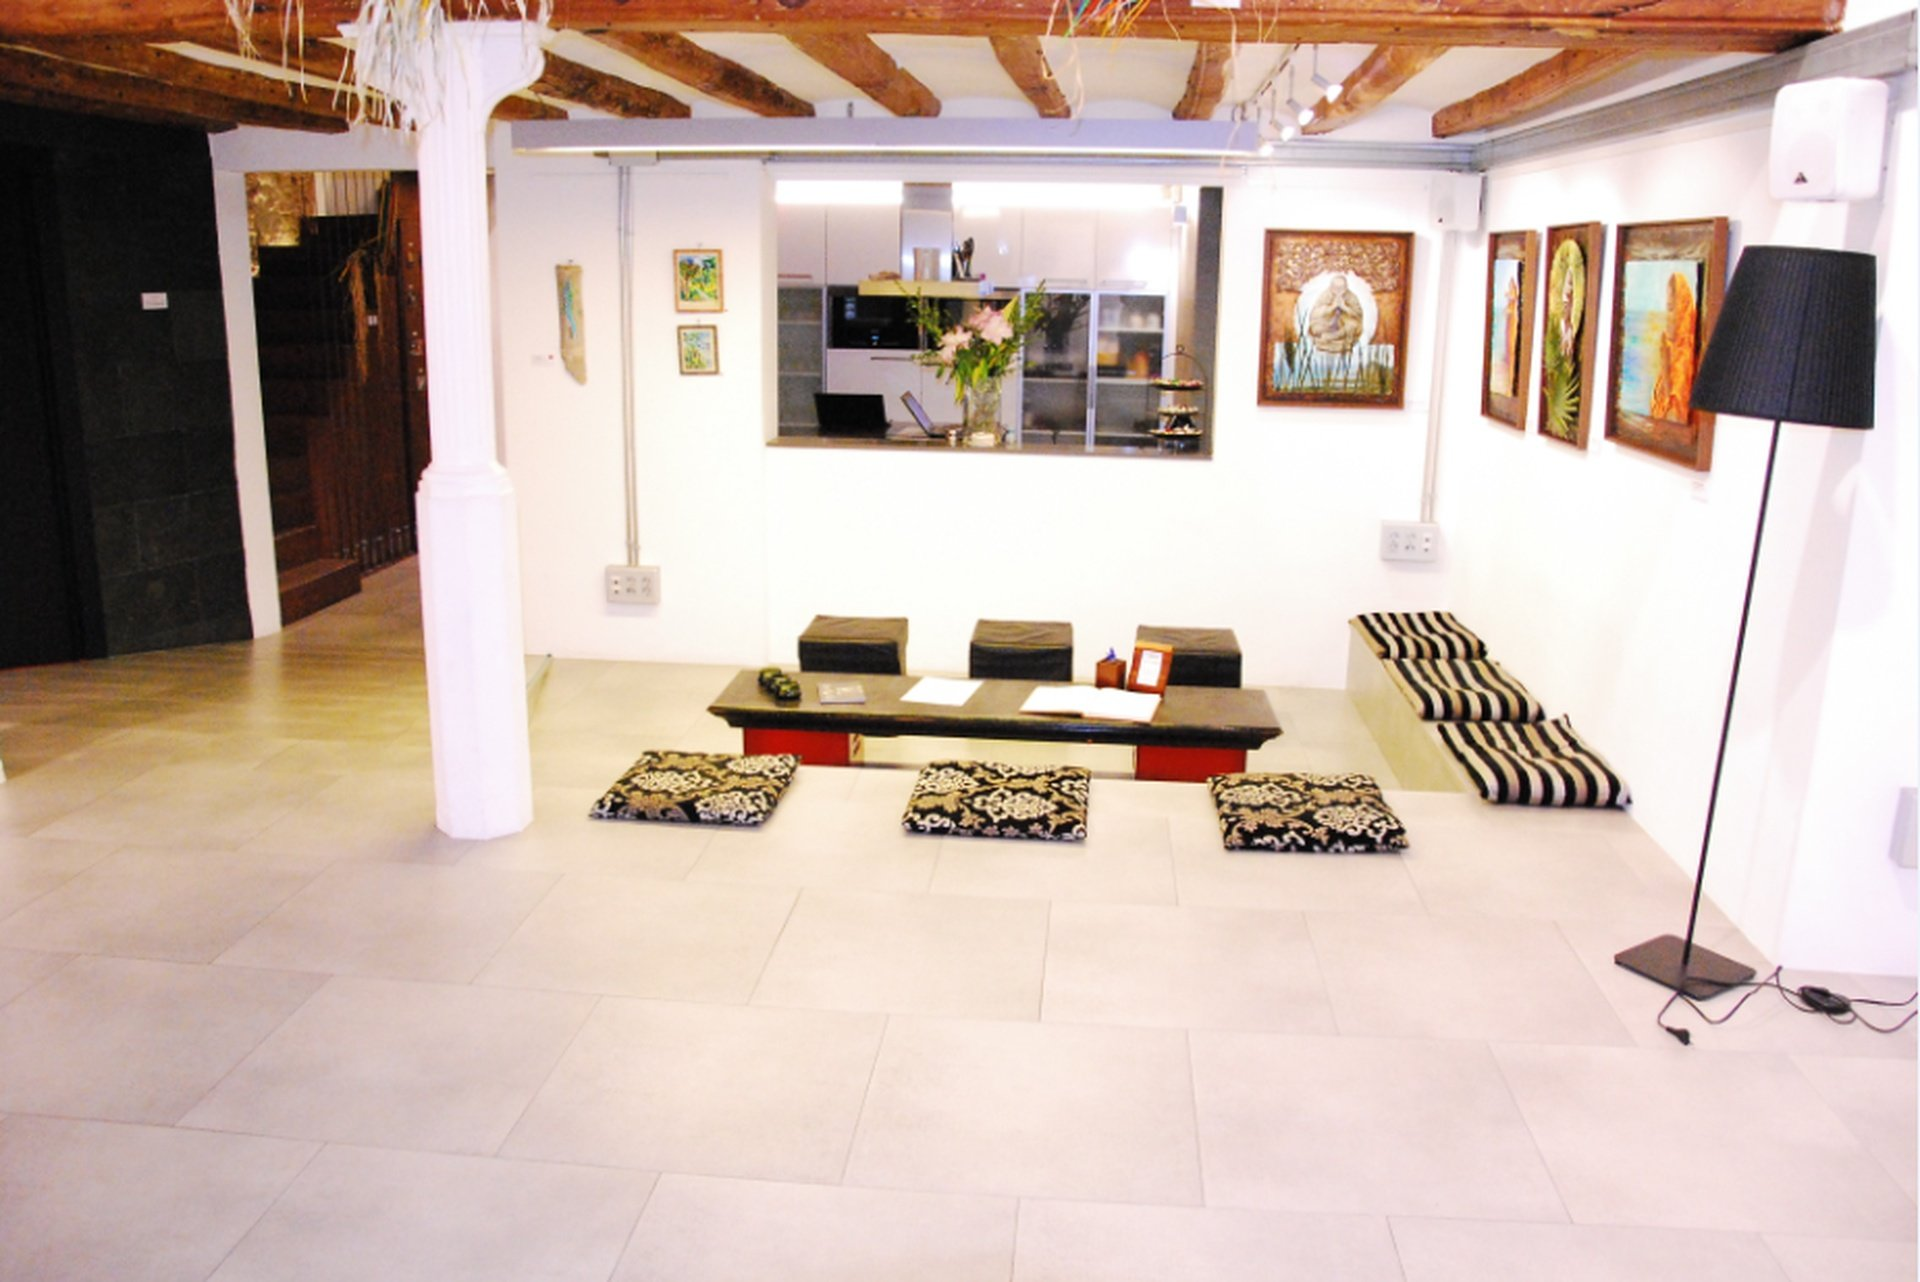 Barcelona workshop spaces Meeting room Mezanina - Ground Floor Main Room image 6